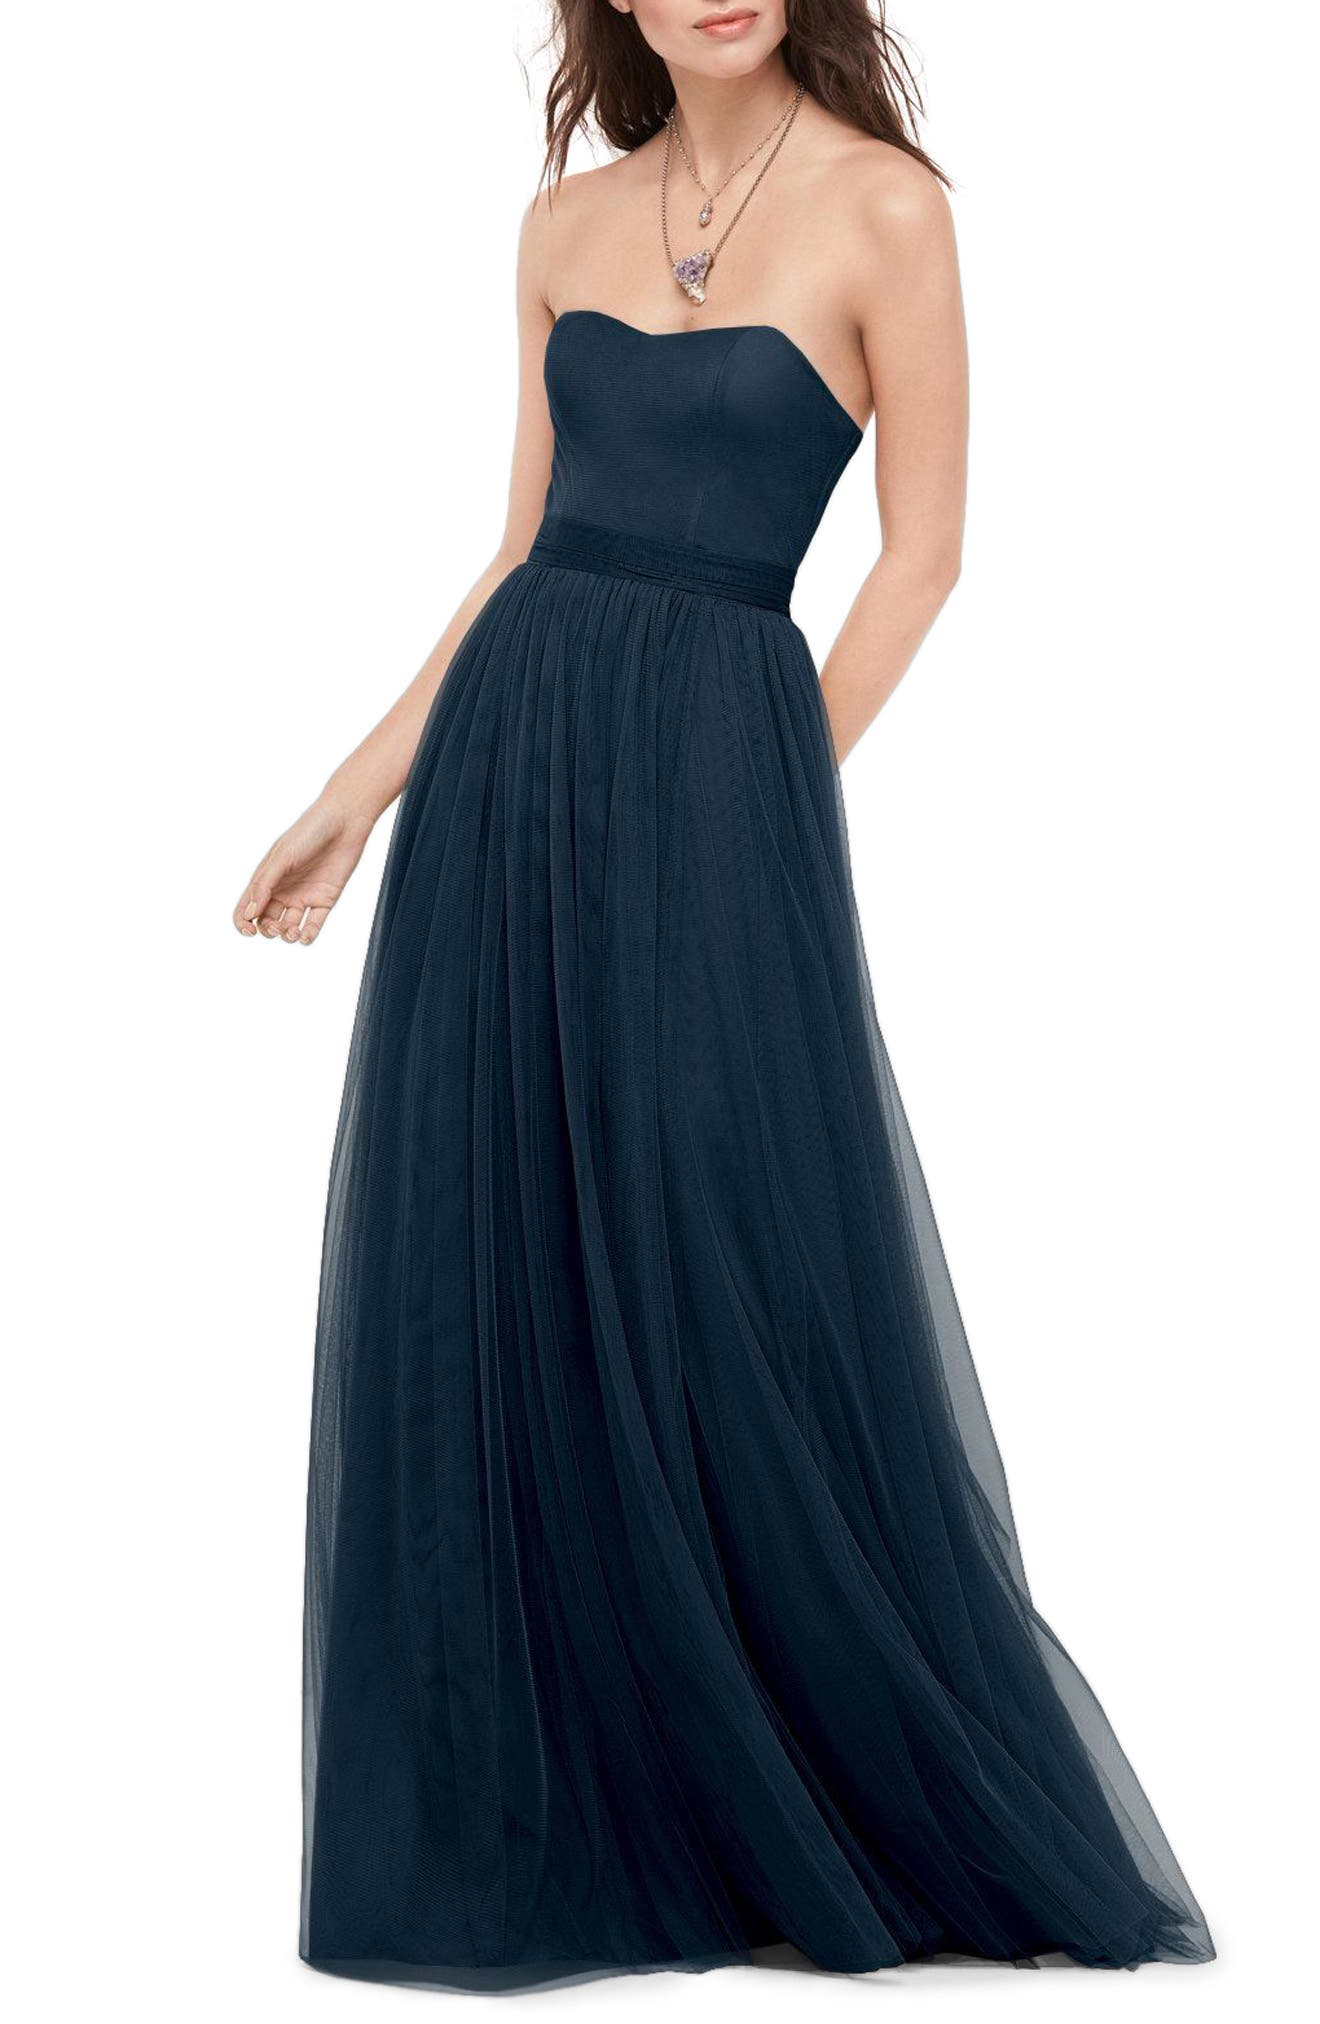 Bobbinet Strapless Gown,                         Main,                         color, Indigo